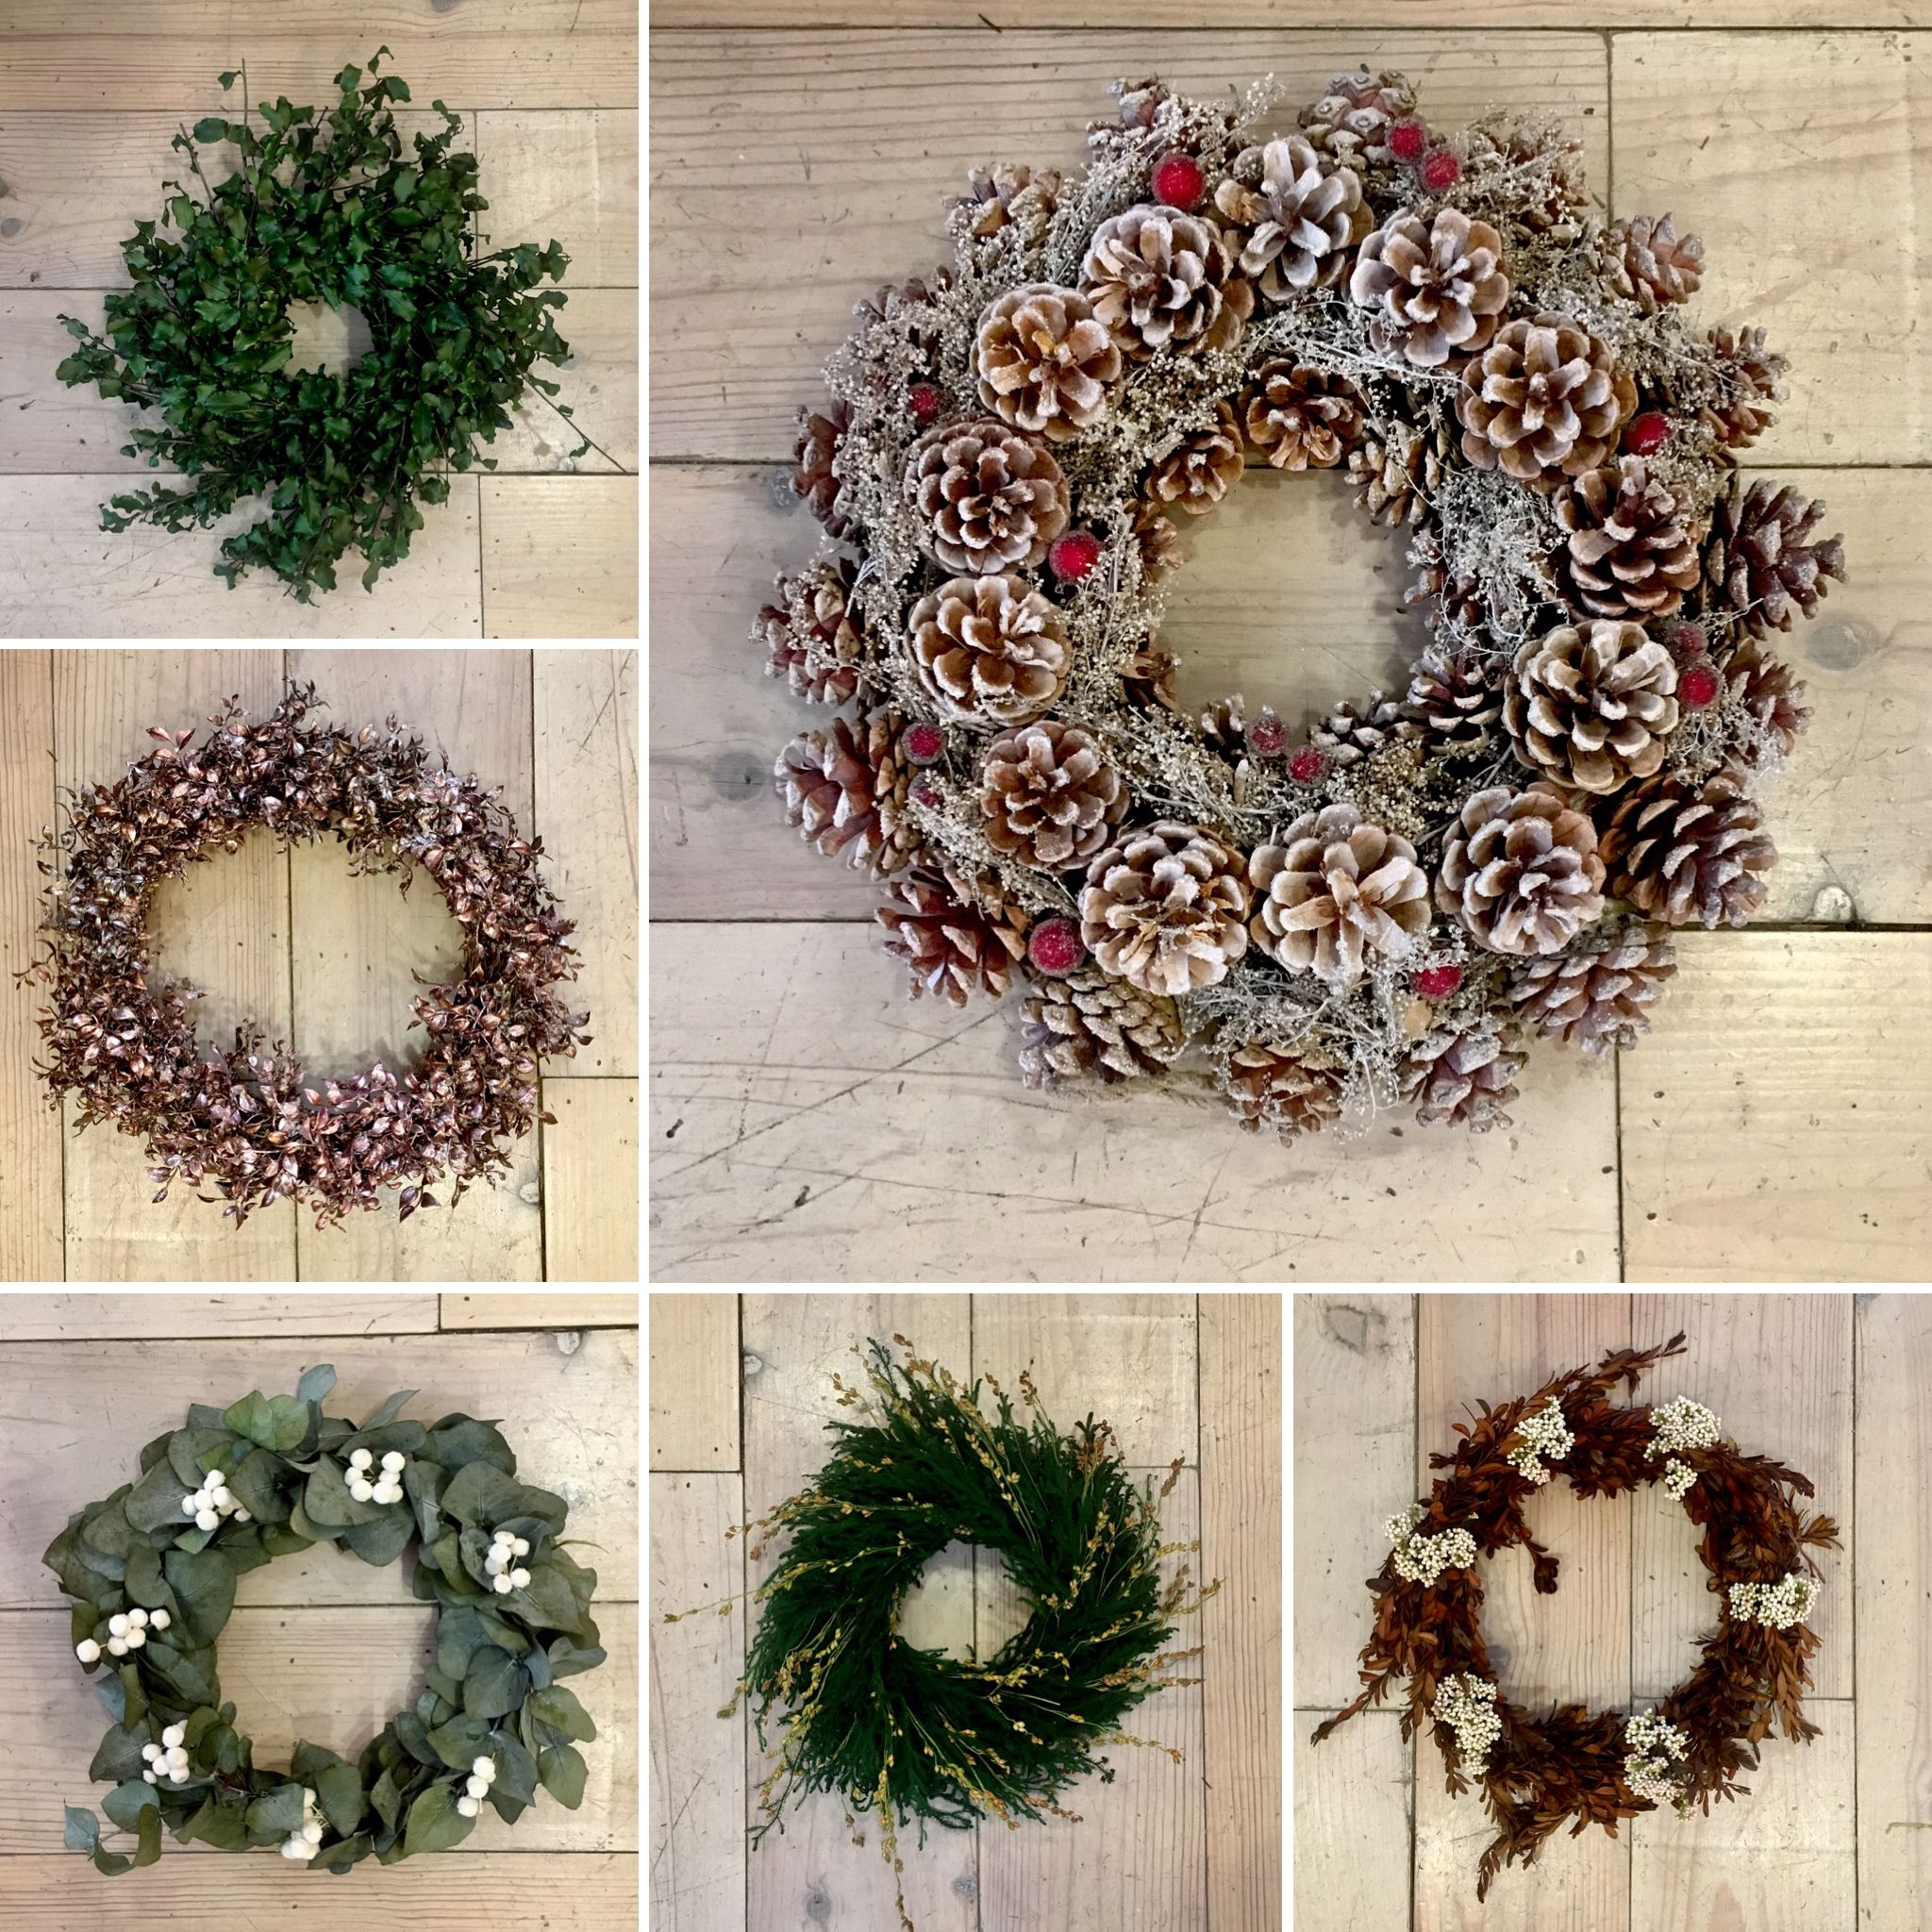 Coronas De Navidad Hechas A Mano Con Flores Y Frutos Naturales Coronas De Navidad De Eucalipto Pino Piña Coronas De Navidad Flores Secas Navidad Hecha A Mano